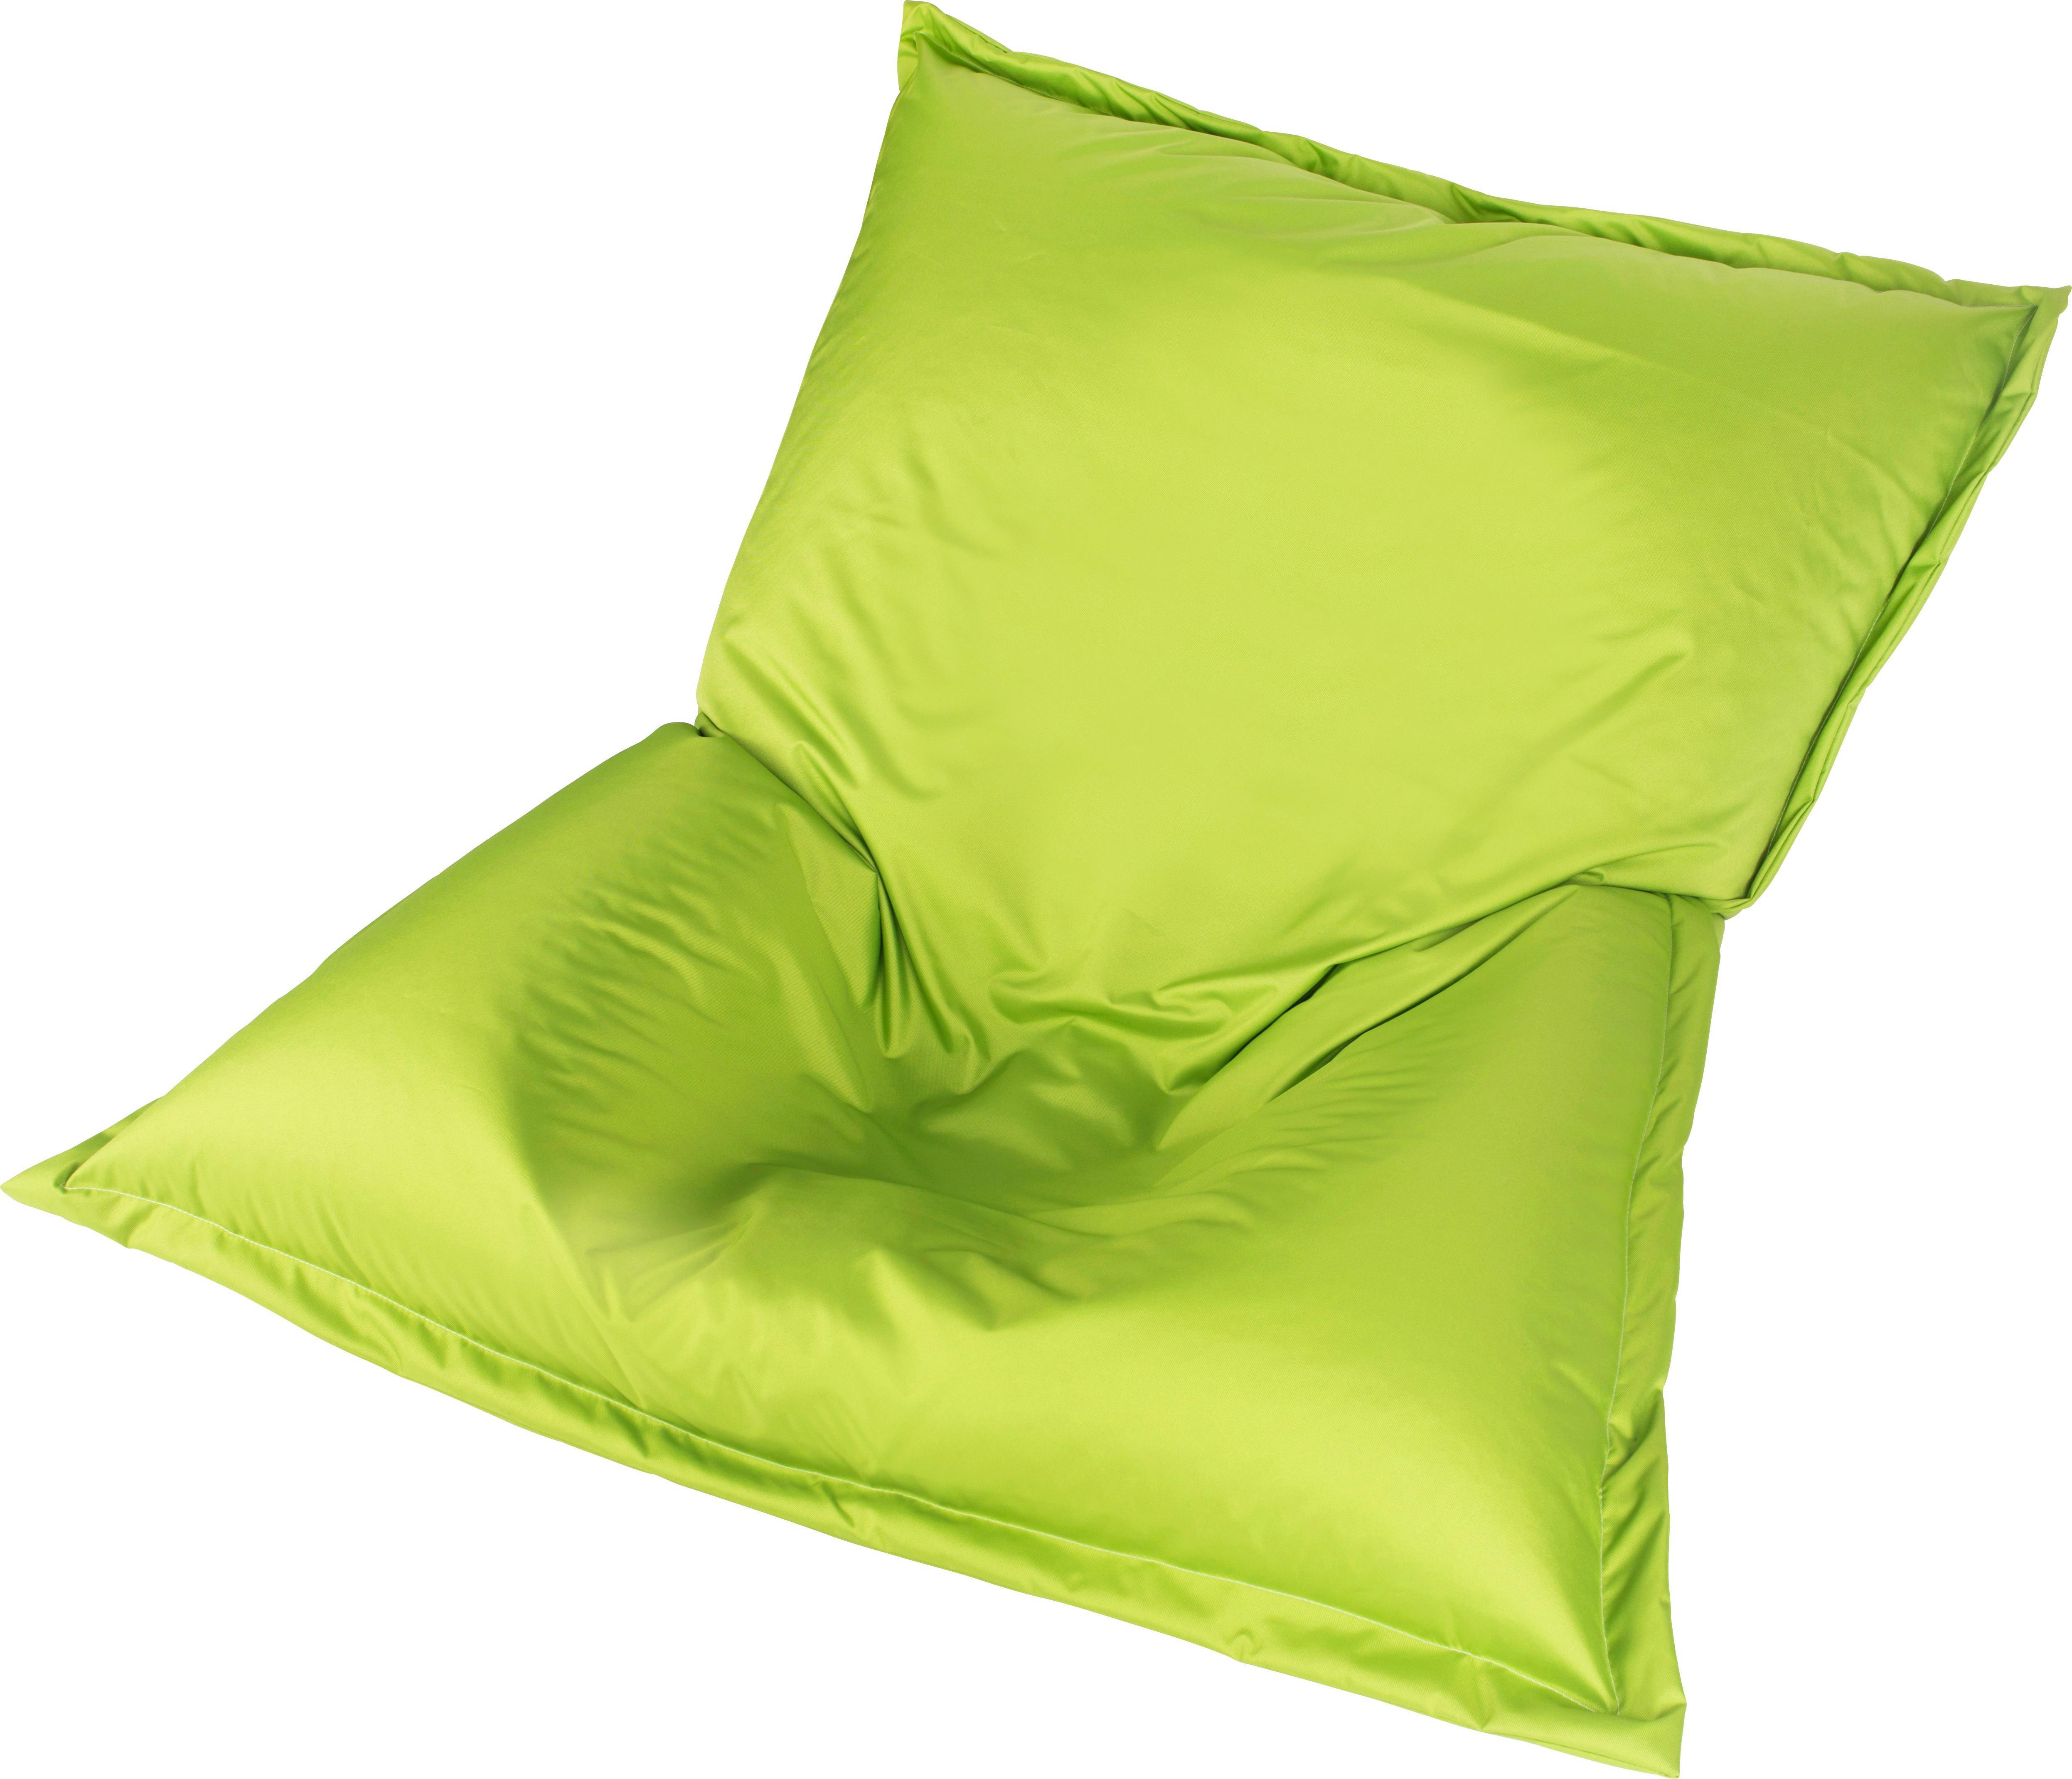 Outdoor Küche Möbelix : Outdoor sitzsack b xl grün online kaufen ➤ möbelix